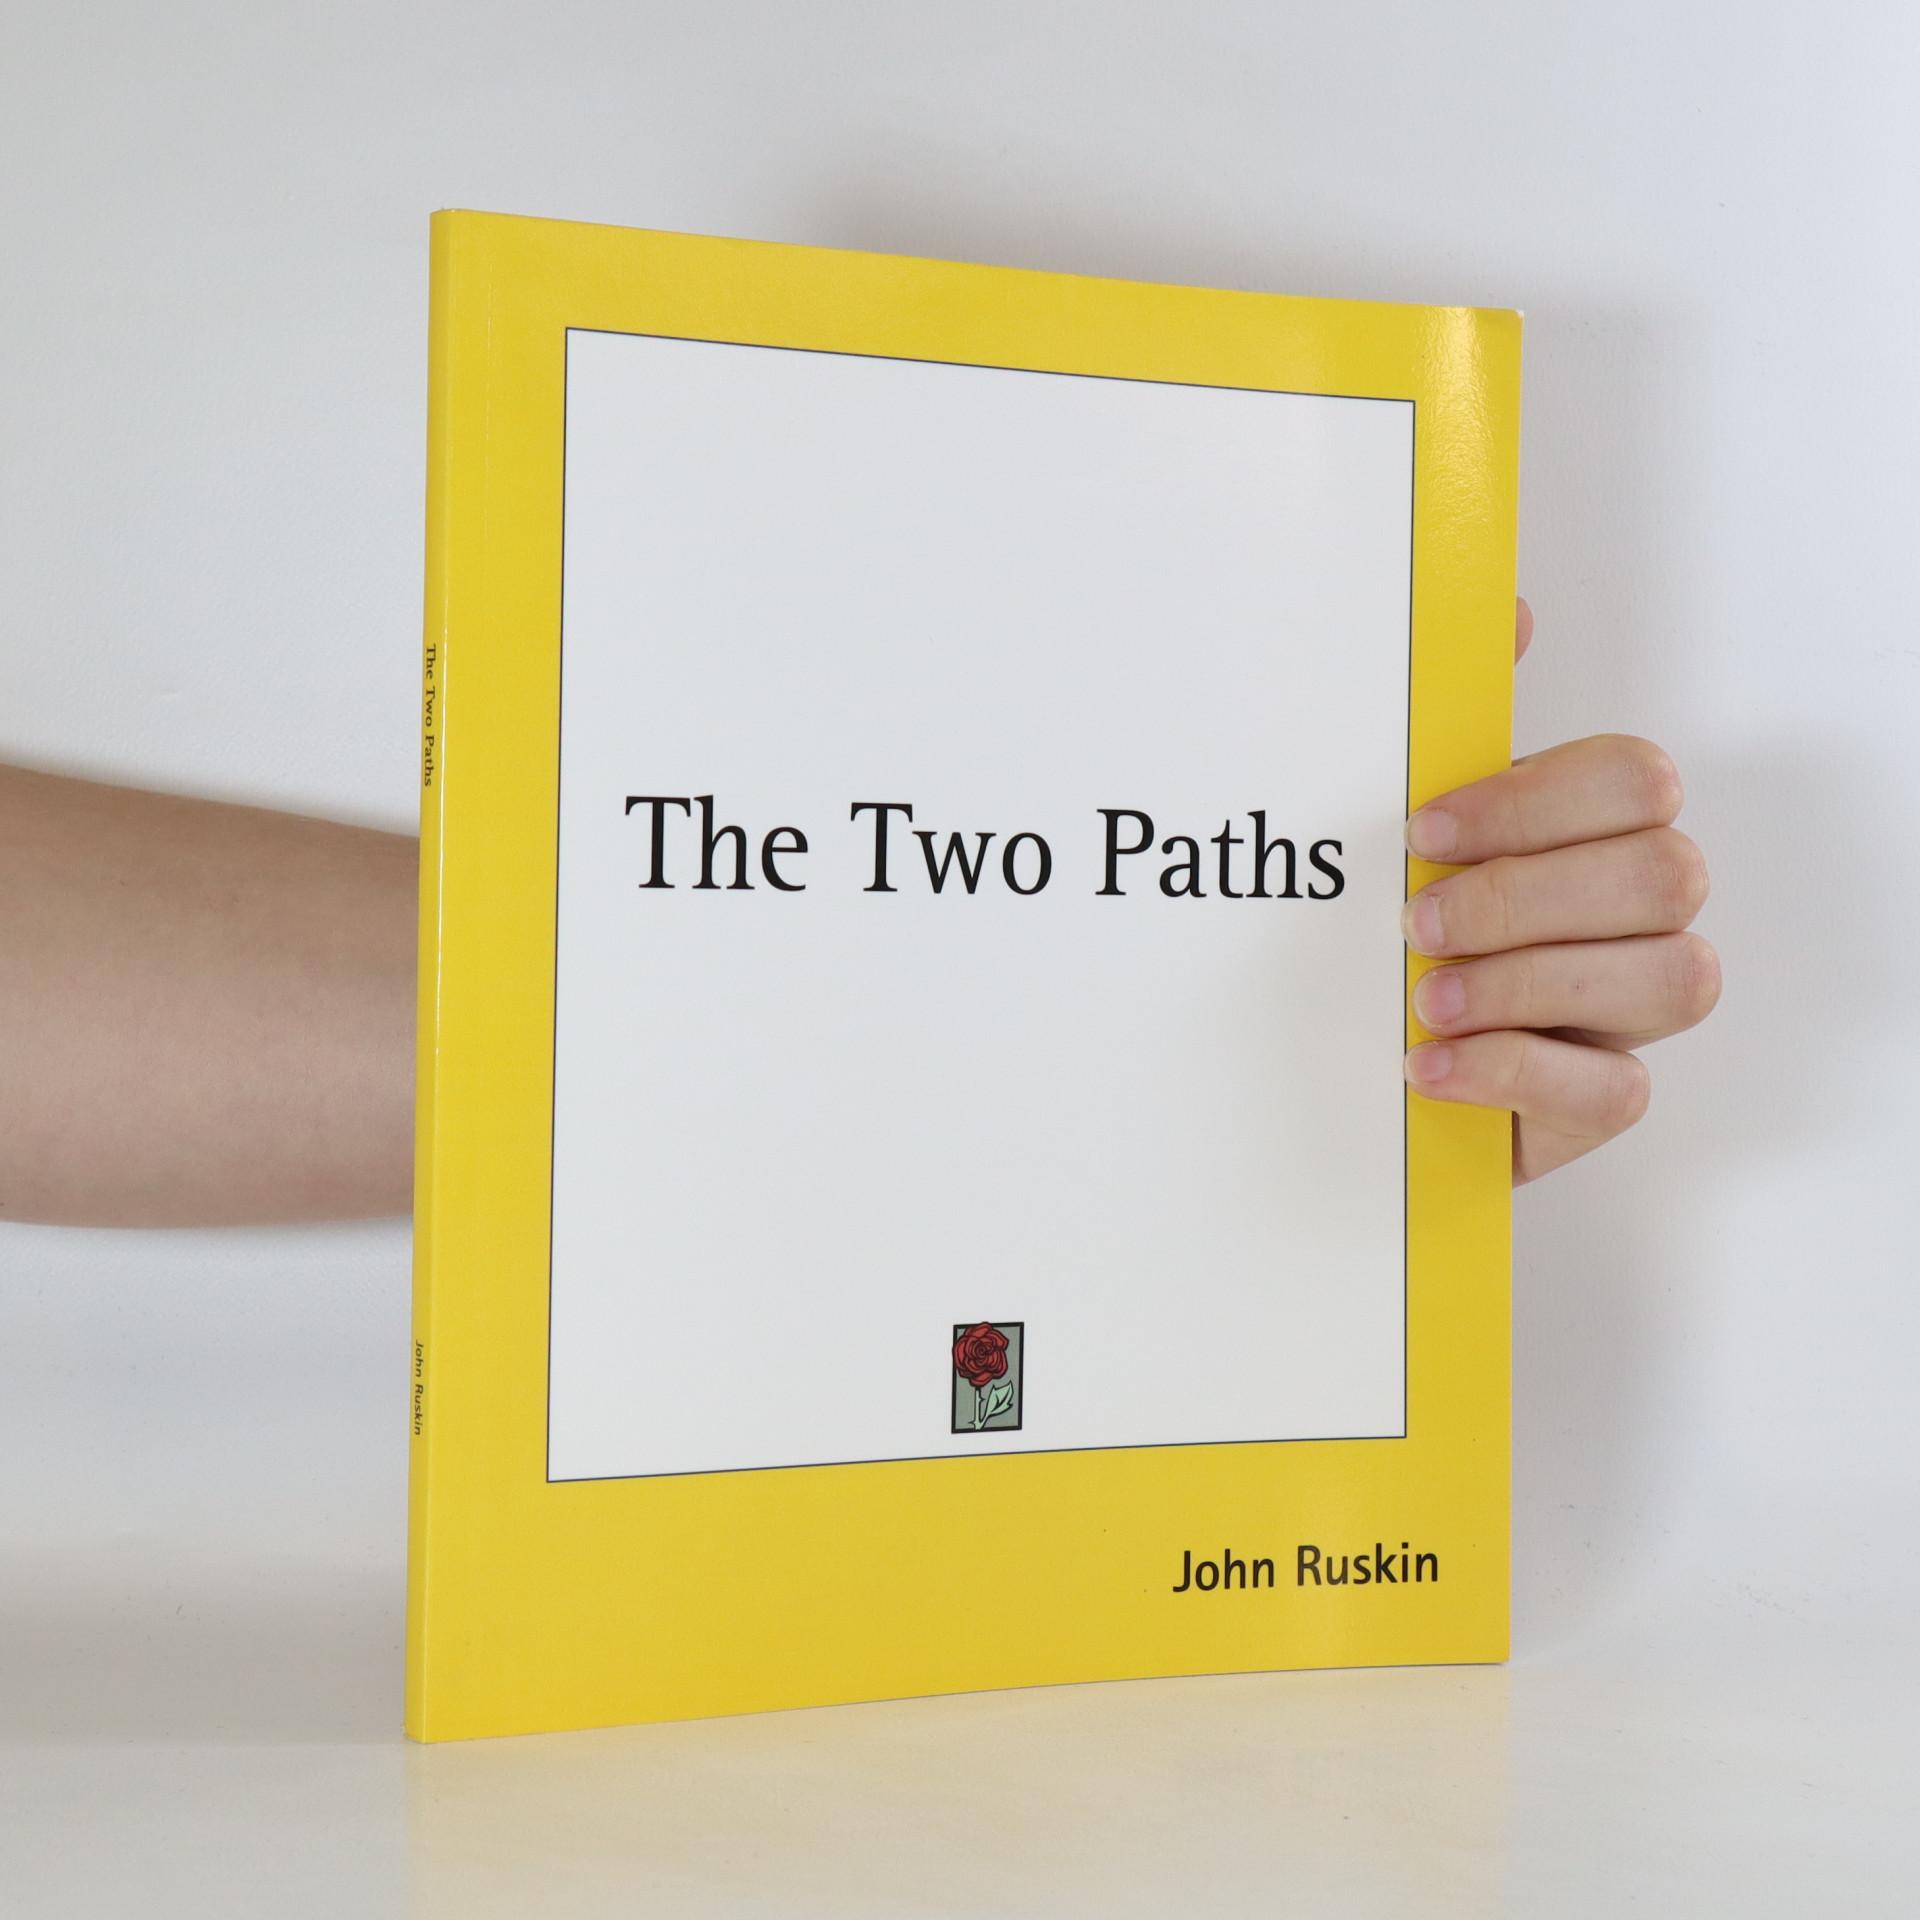 antikvární kniha The Two Paths, neuveden